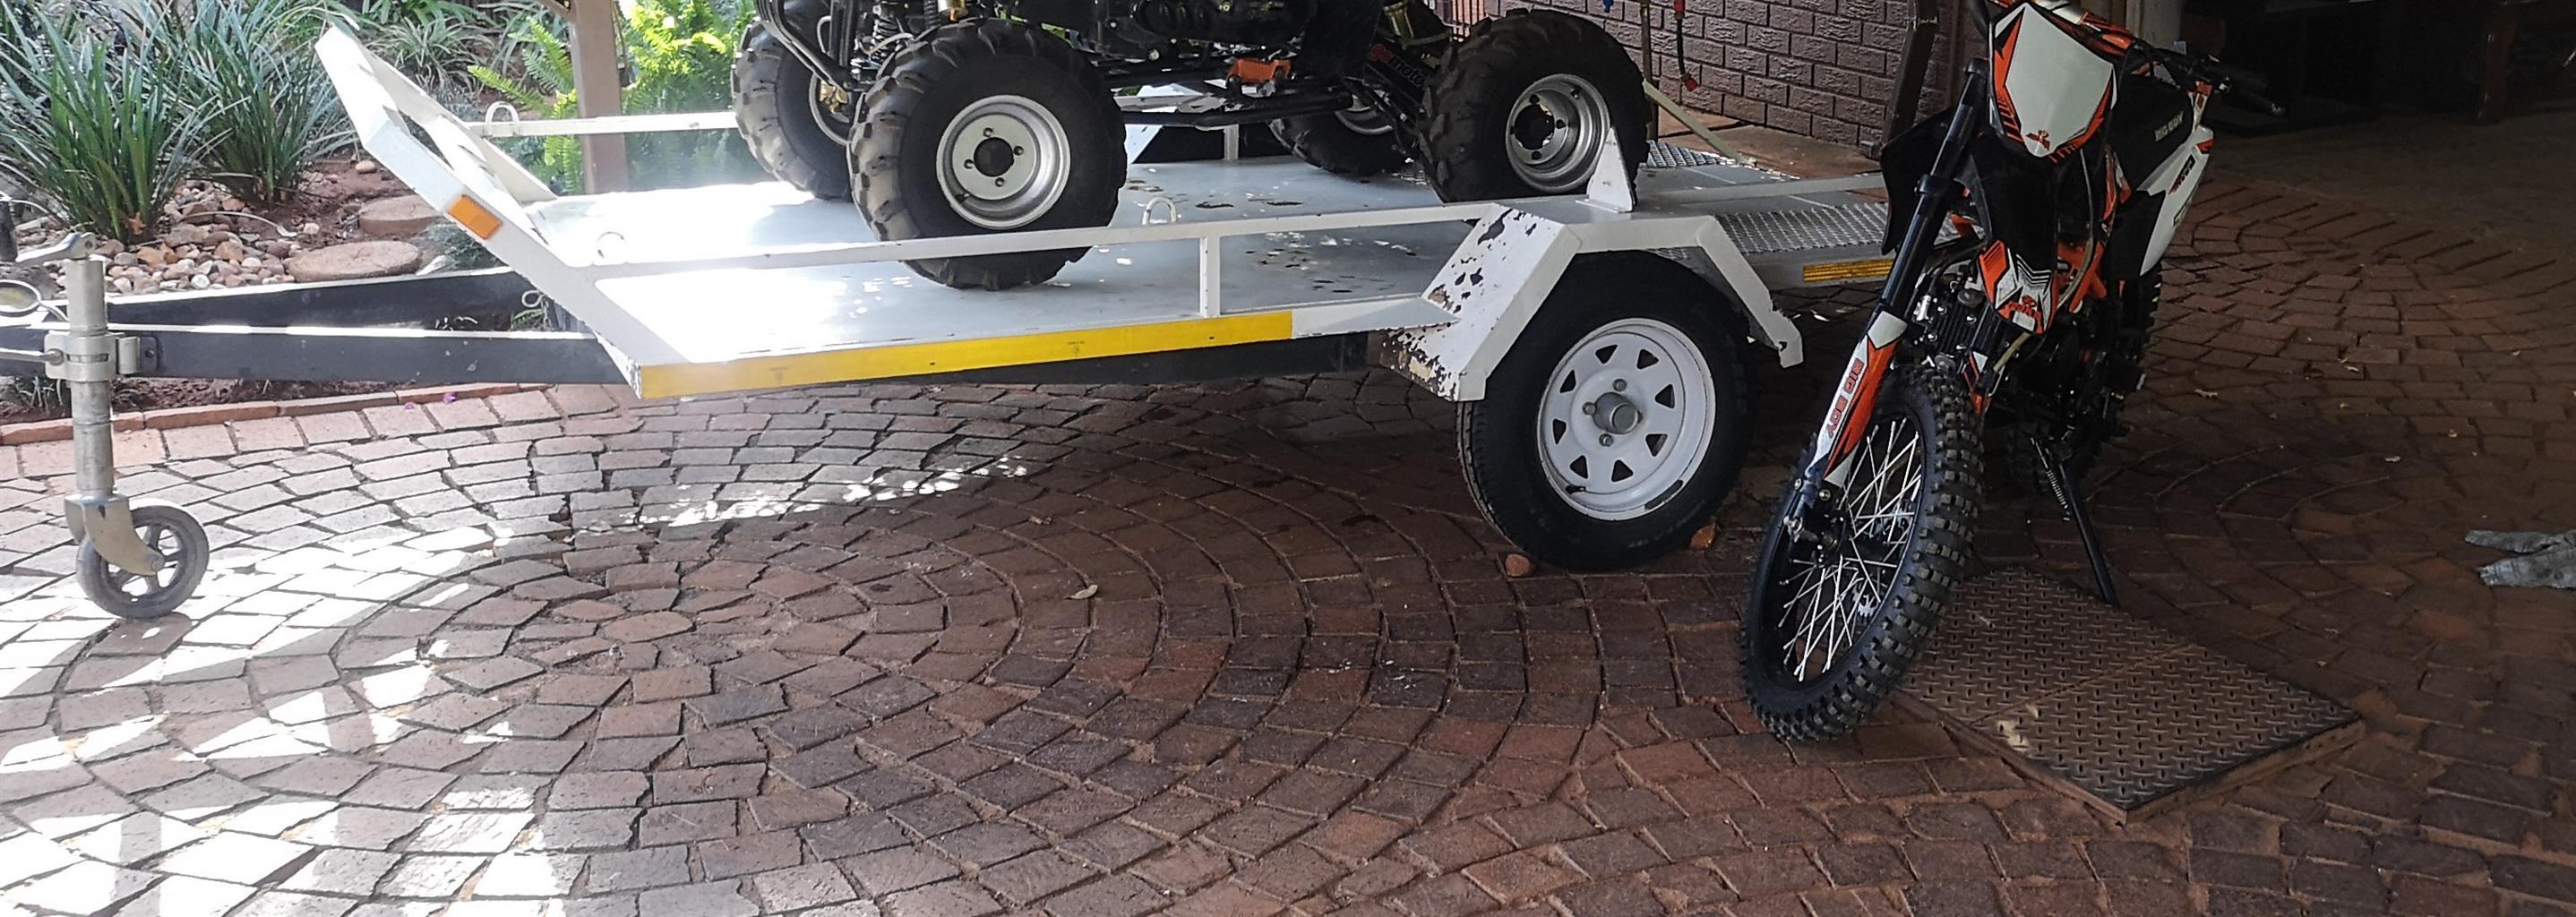 Quad/ Bike or Golf cart Trailor